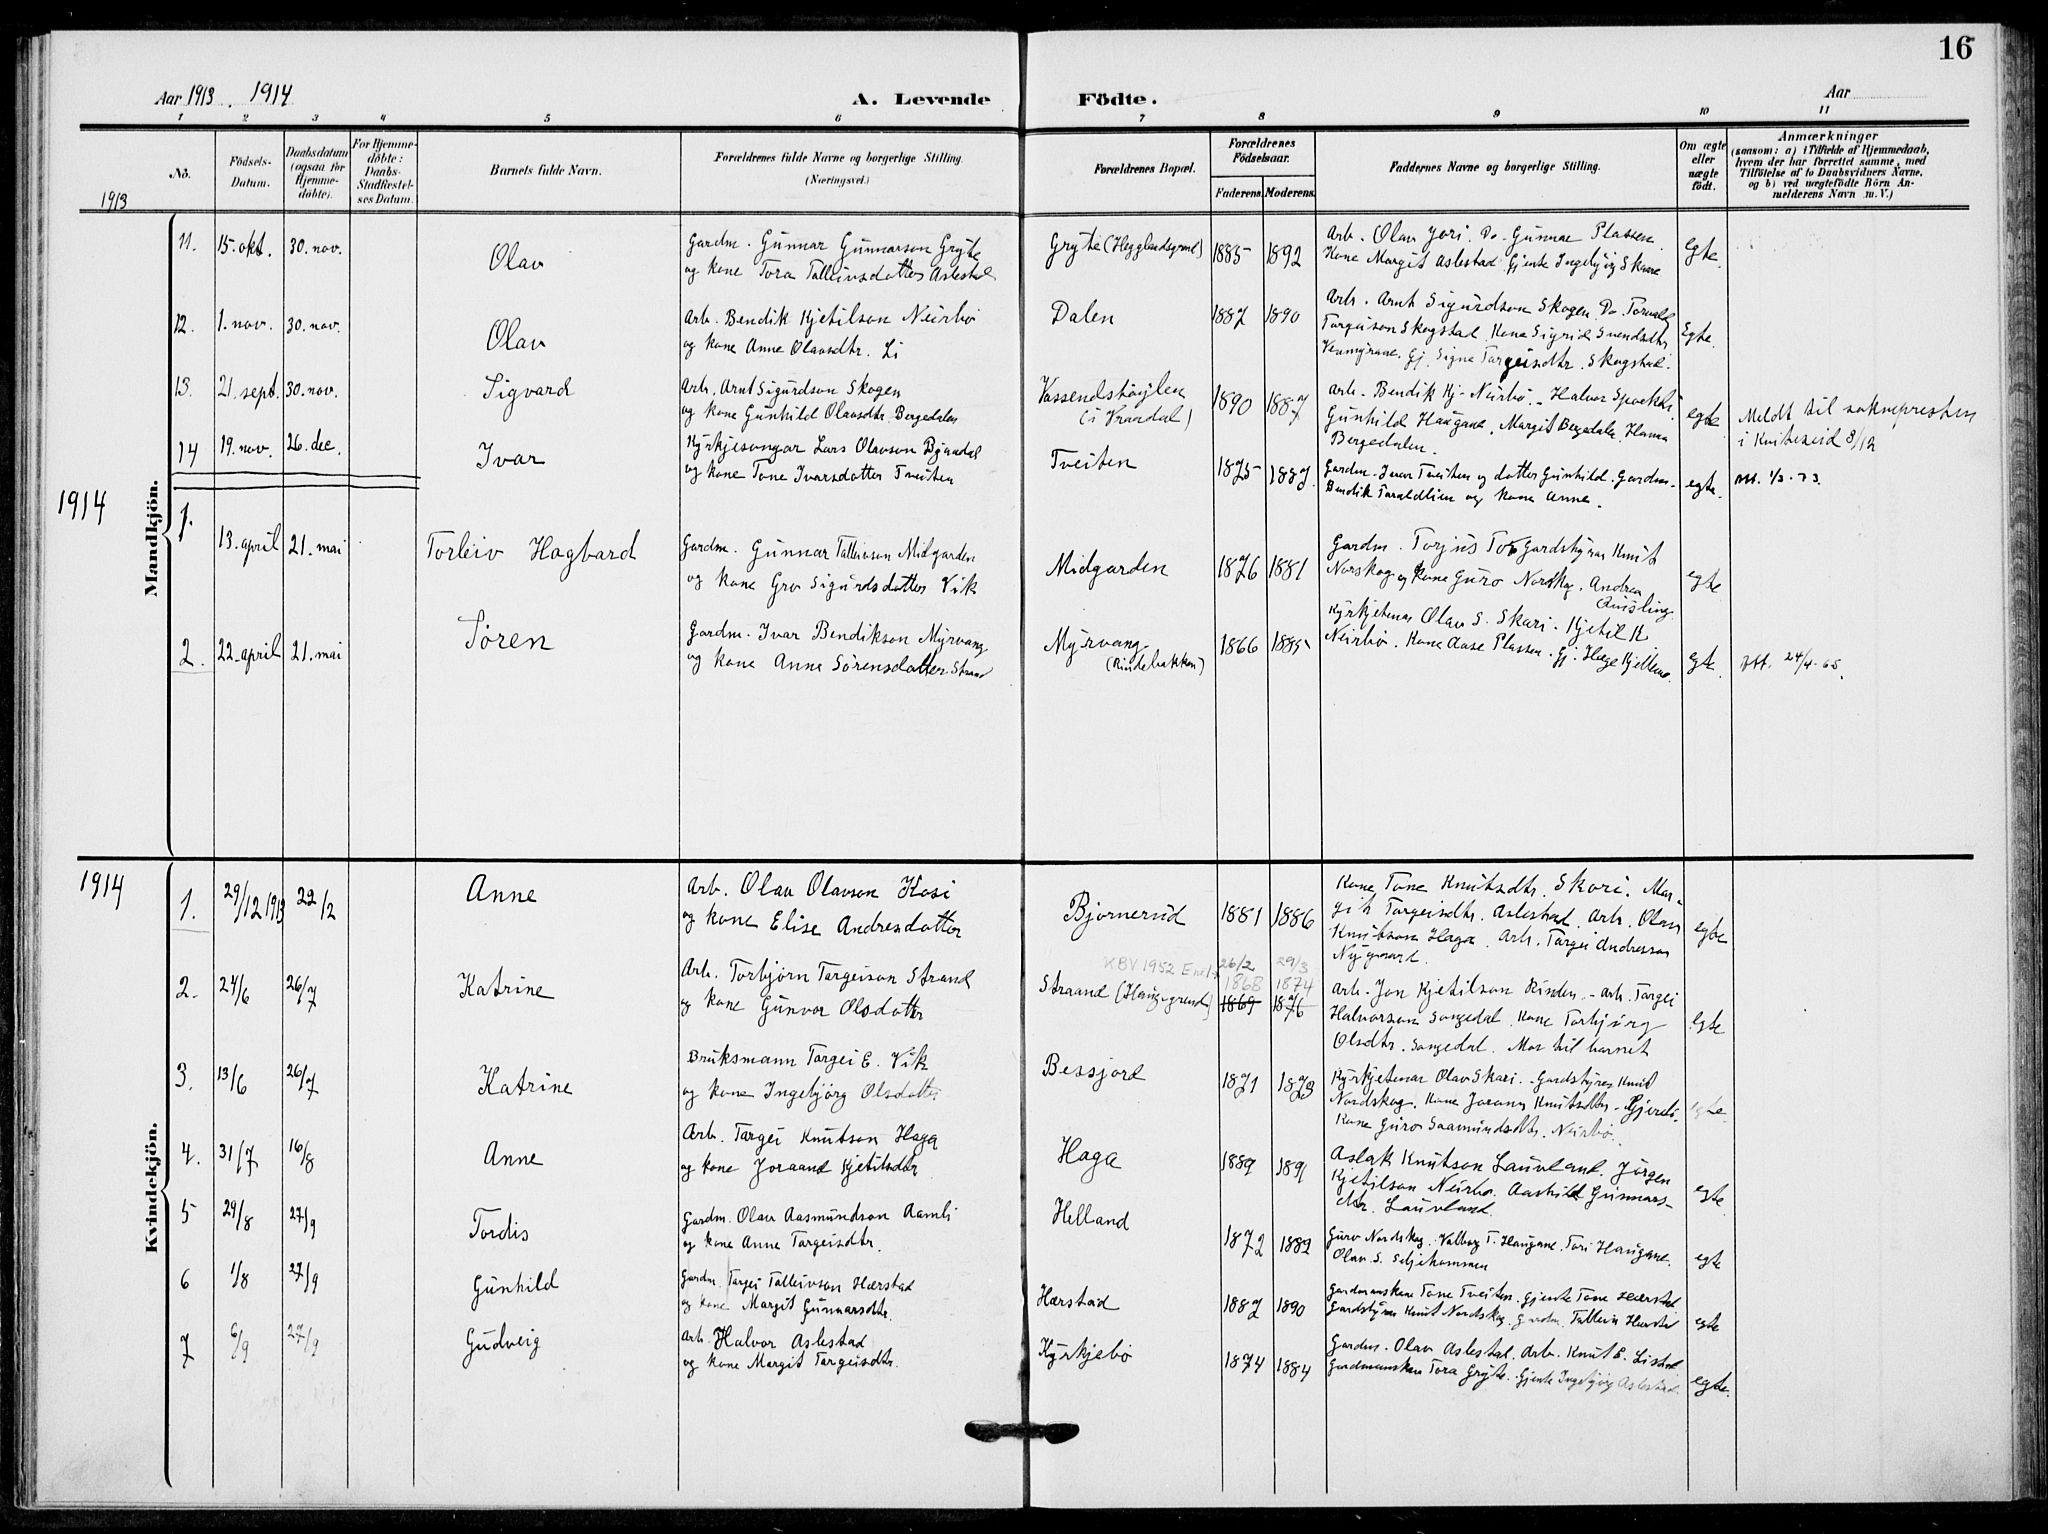 SAKO, Fyresdal kirkebøker, F/Fb/L0004: Ministerialbok nr. II 4, 1903-1920, s. 16